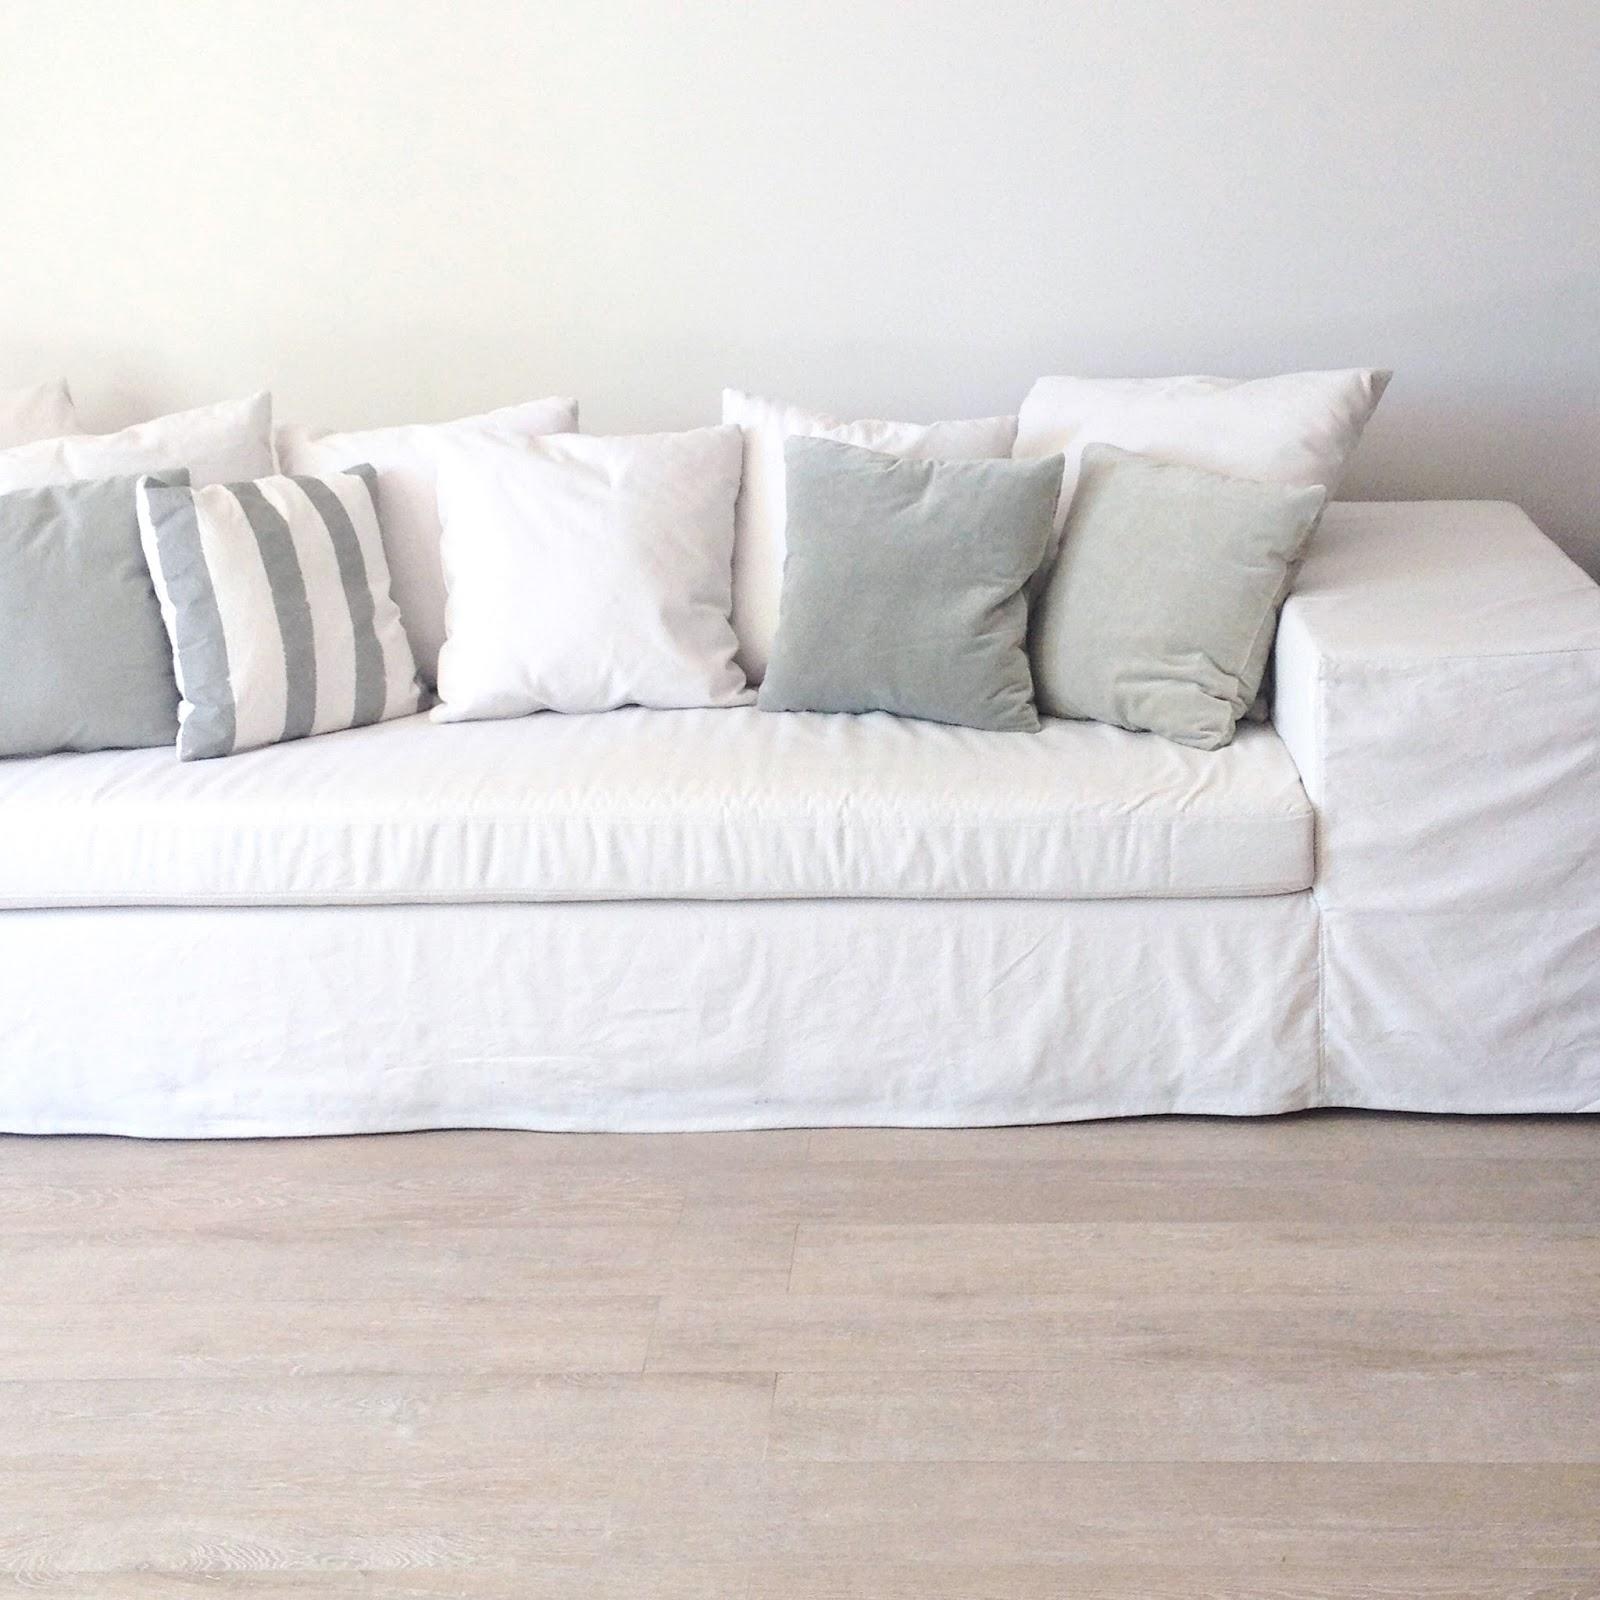 alma deco buenos aires febrero 2016. Black Bedroom Furniture Sets. Home Design Ideas